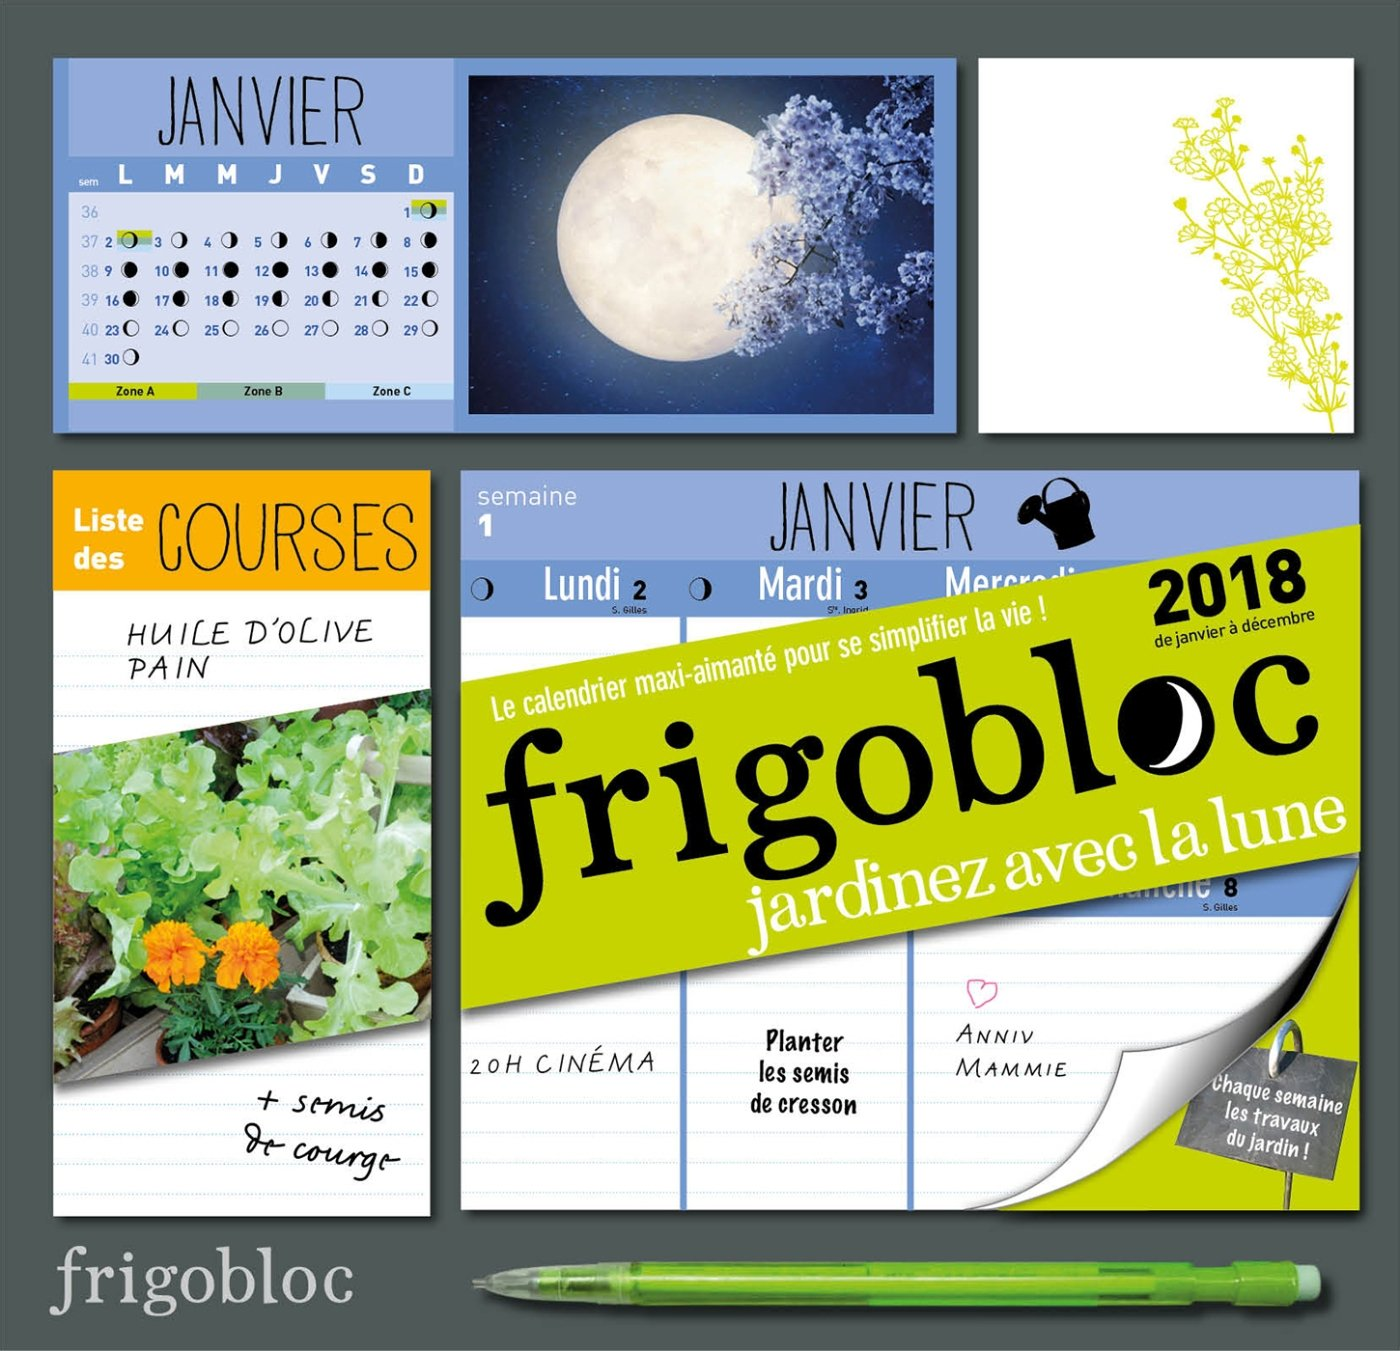 Amazonfr Frigobloc 2018 Spécial Jardiner Avec La Lune